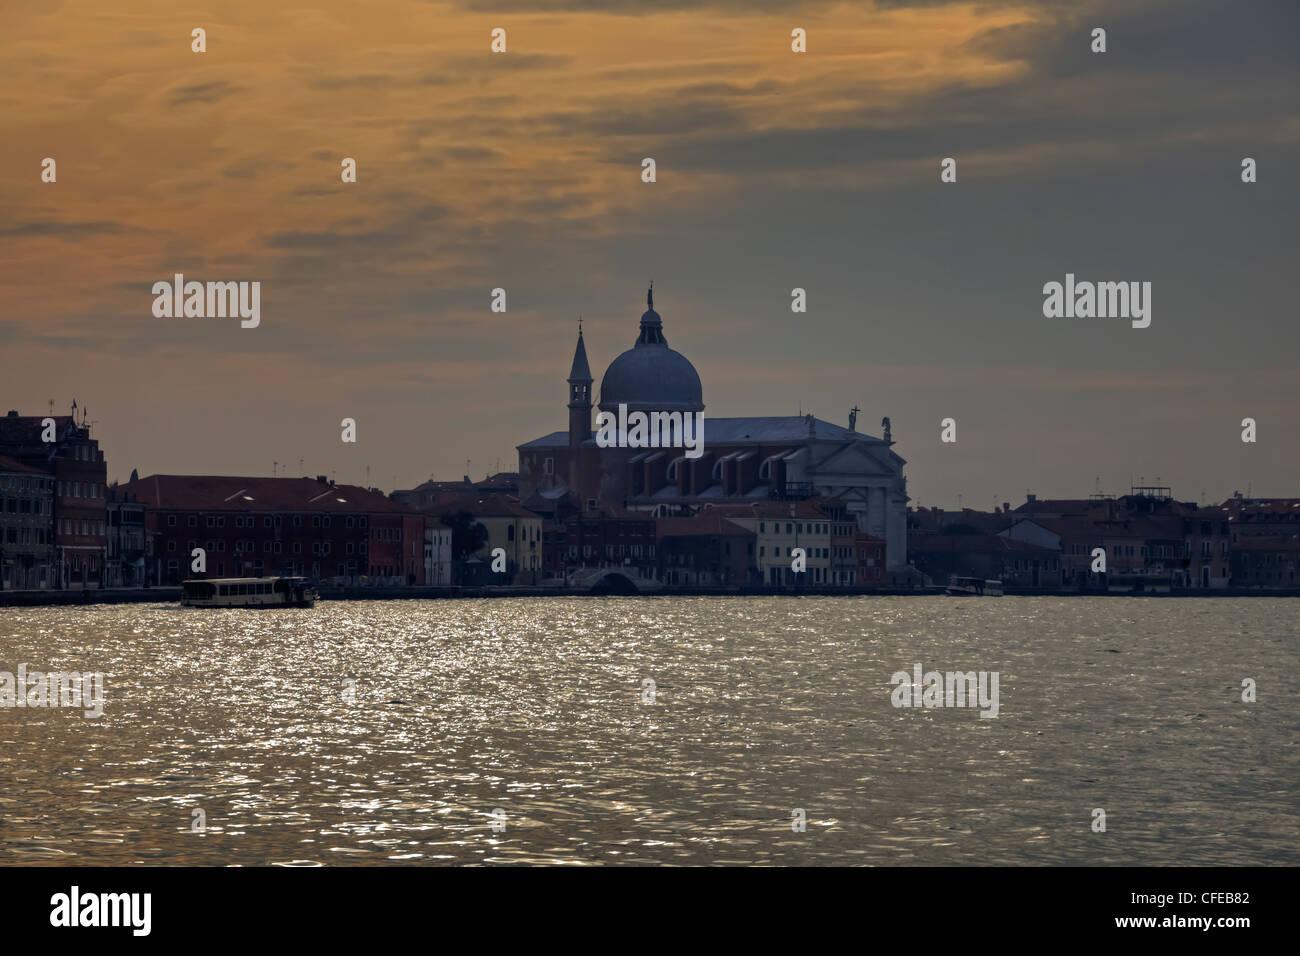 Church of the Redeemer il, Giudecca, Venice, Veneto, Italy, sunset - Stock Image